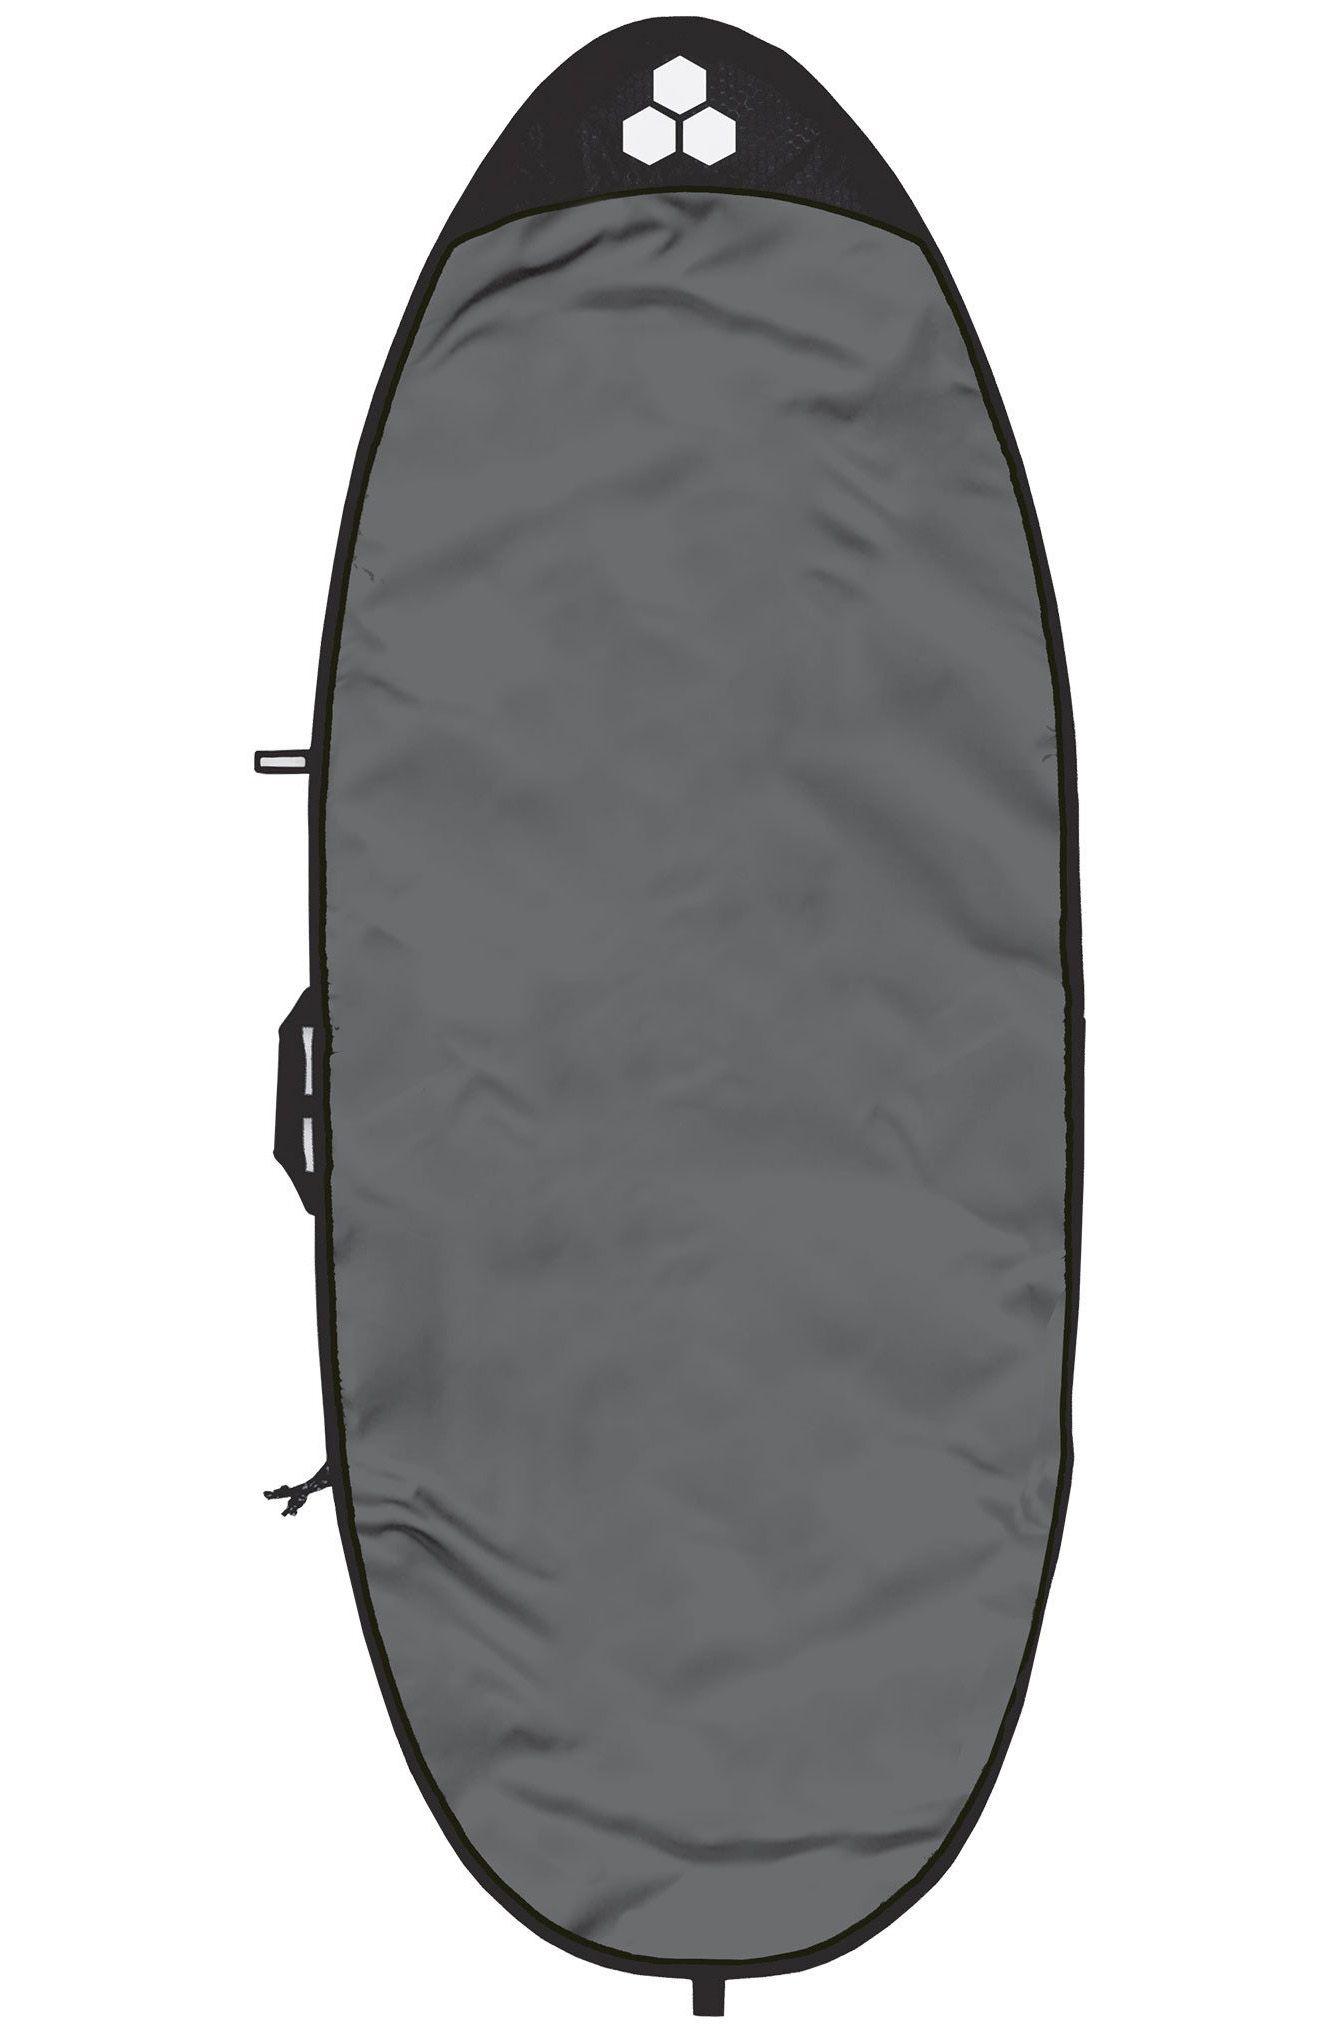 Al Merrick Boardbag 7'0 FEATHER LITE SPECIALTY BAG Charcoal